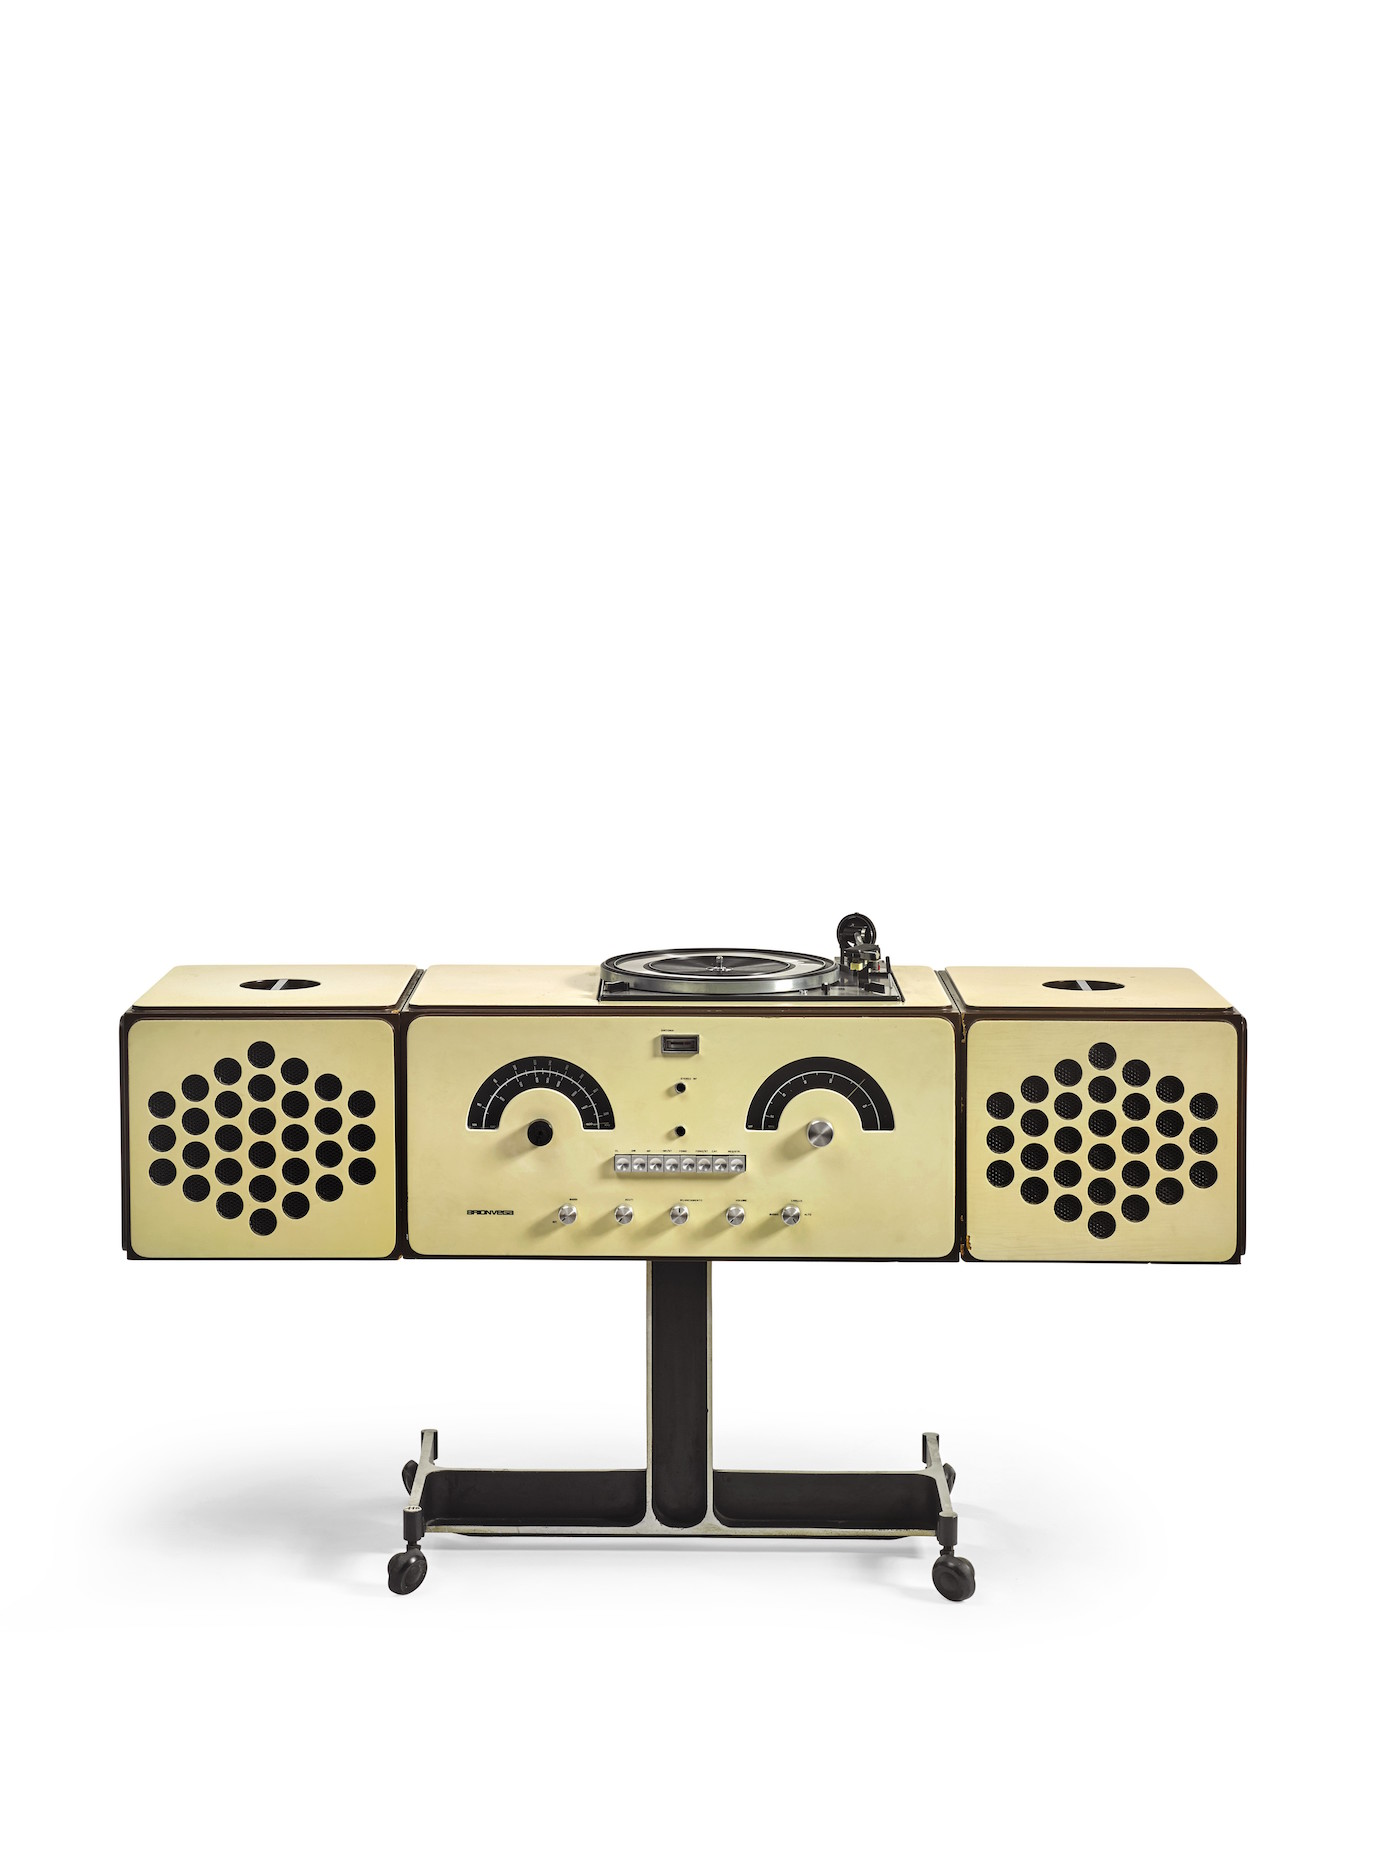 Pier Giacomo and Achille Castiglioni, Brionvega Radiophonograph, model no RR 126, 1965 £800-1,200